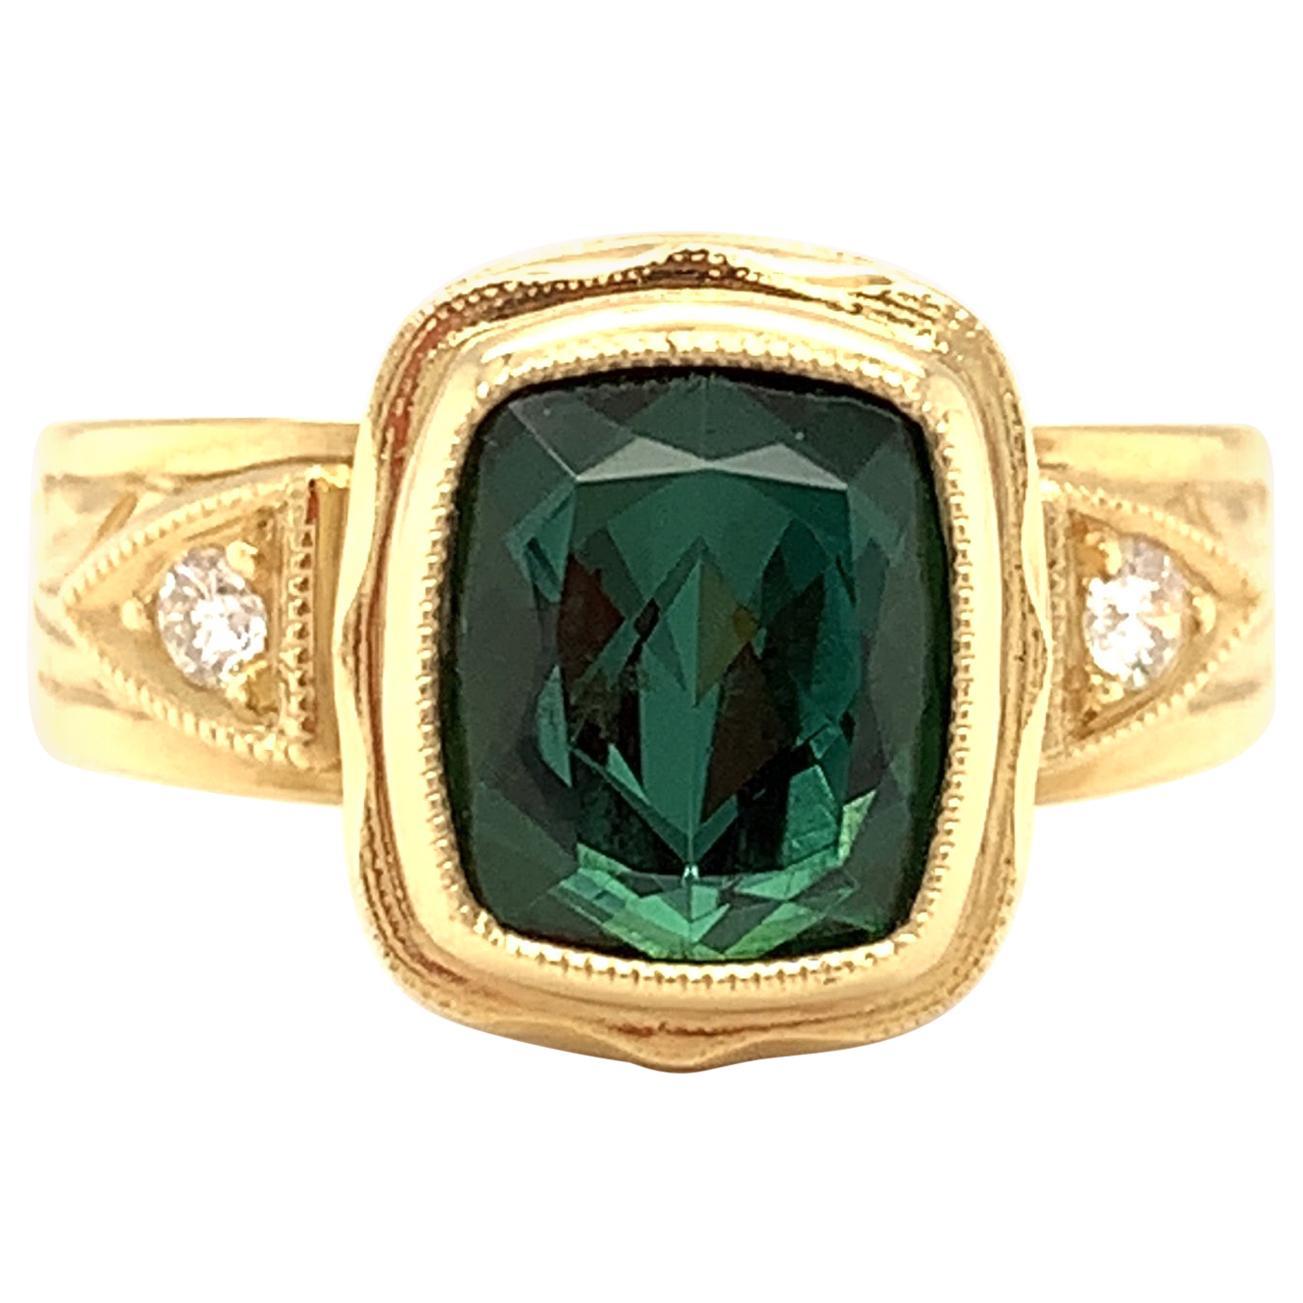 2.48 Carat Blue-Green Tourmaline, Diamond, Yellow Gold Bezel Hand Engraved Ring